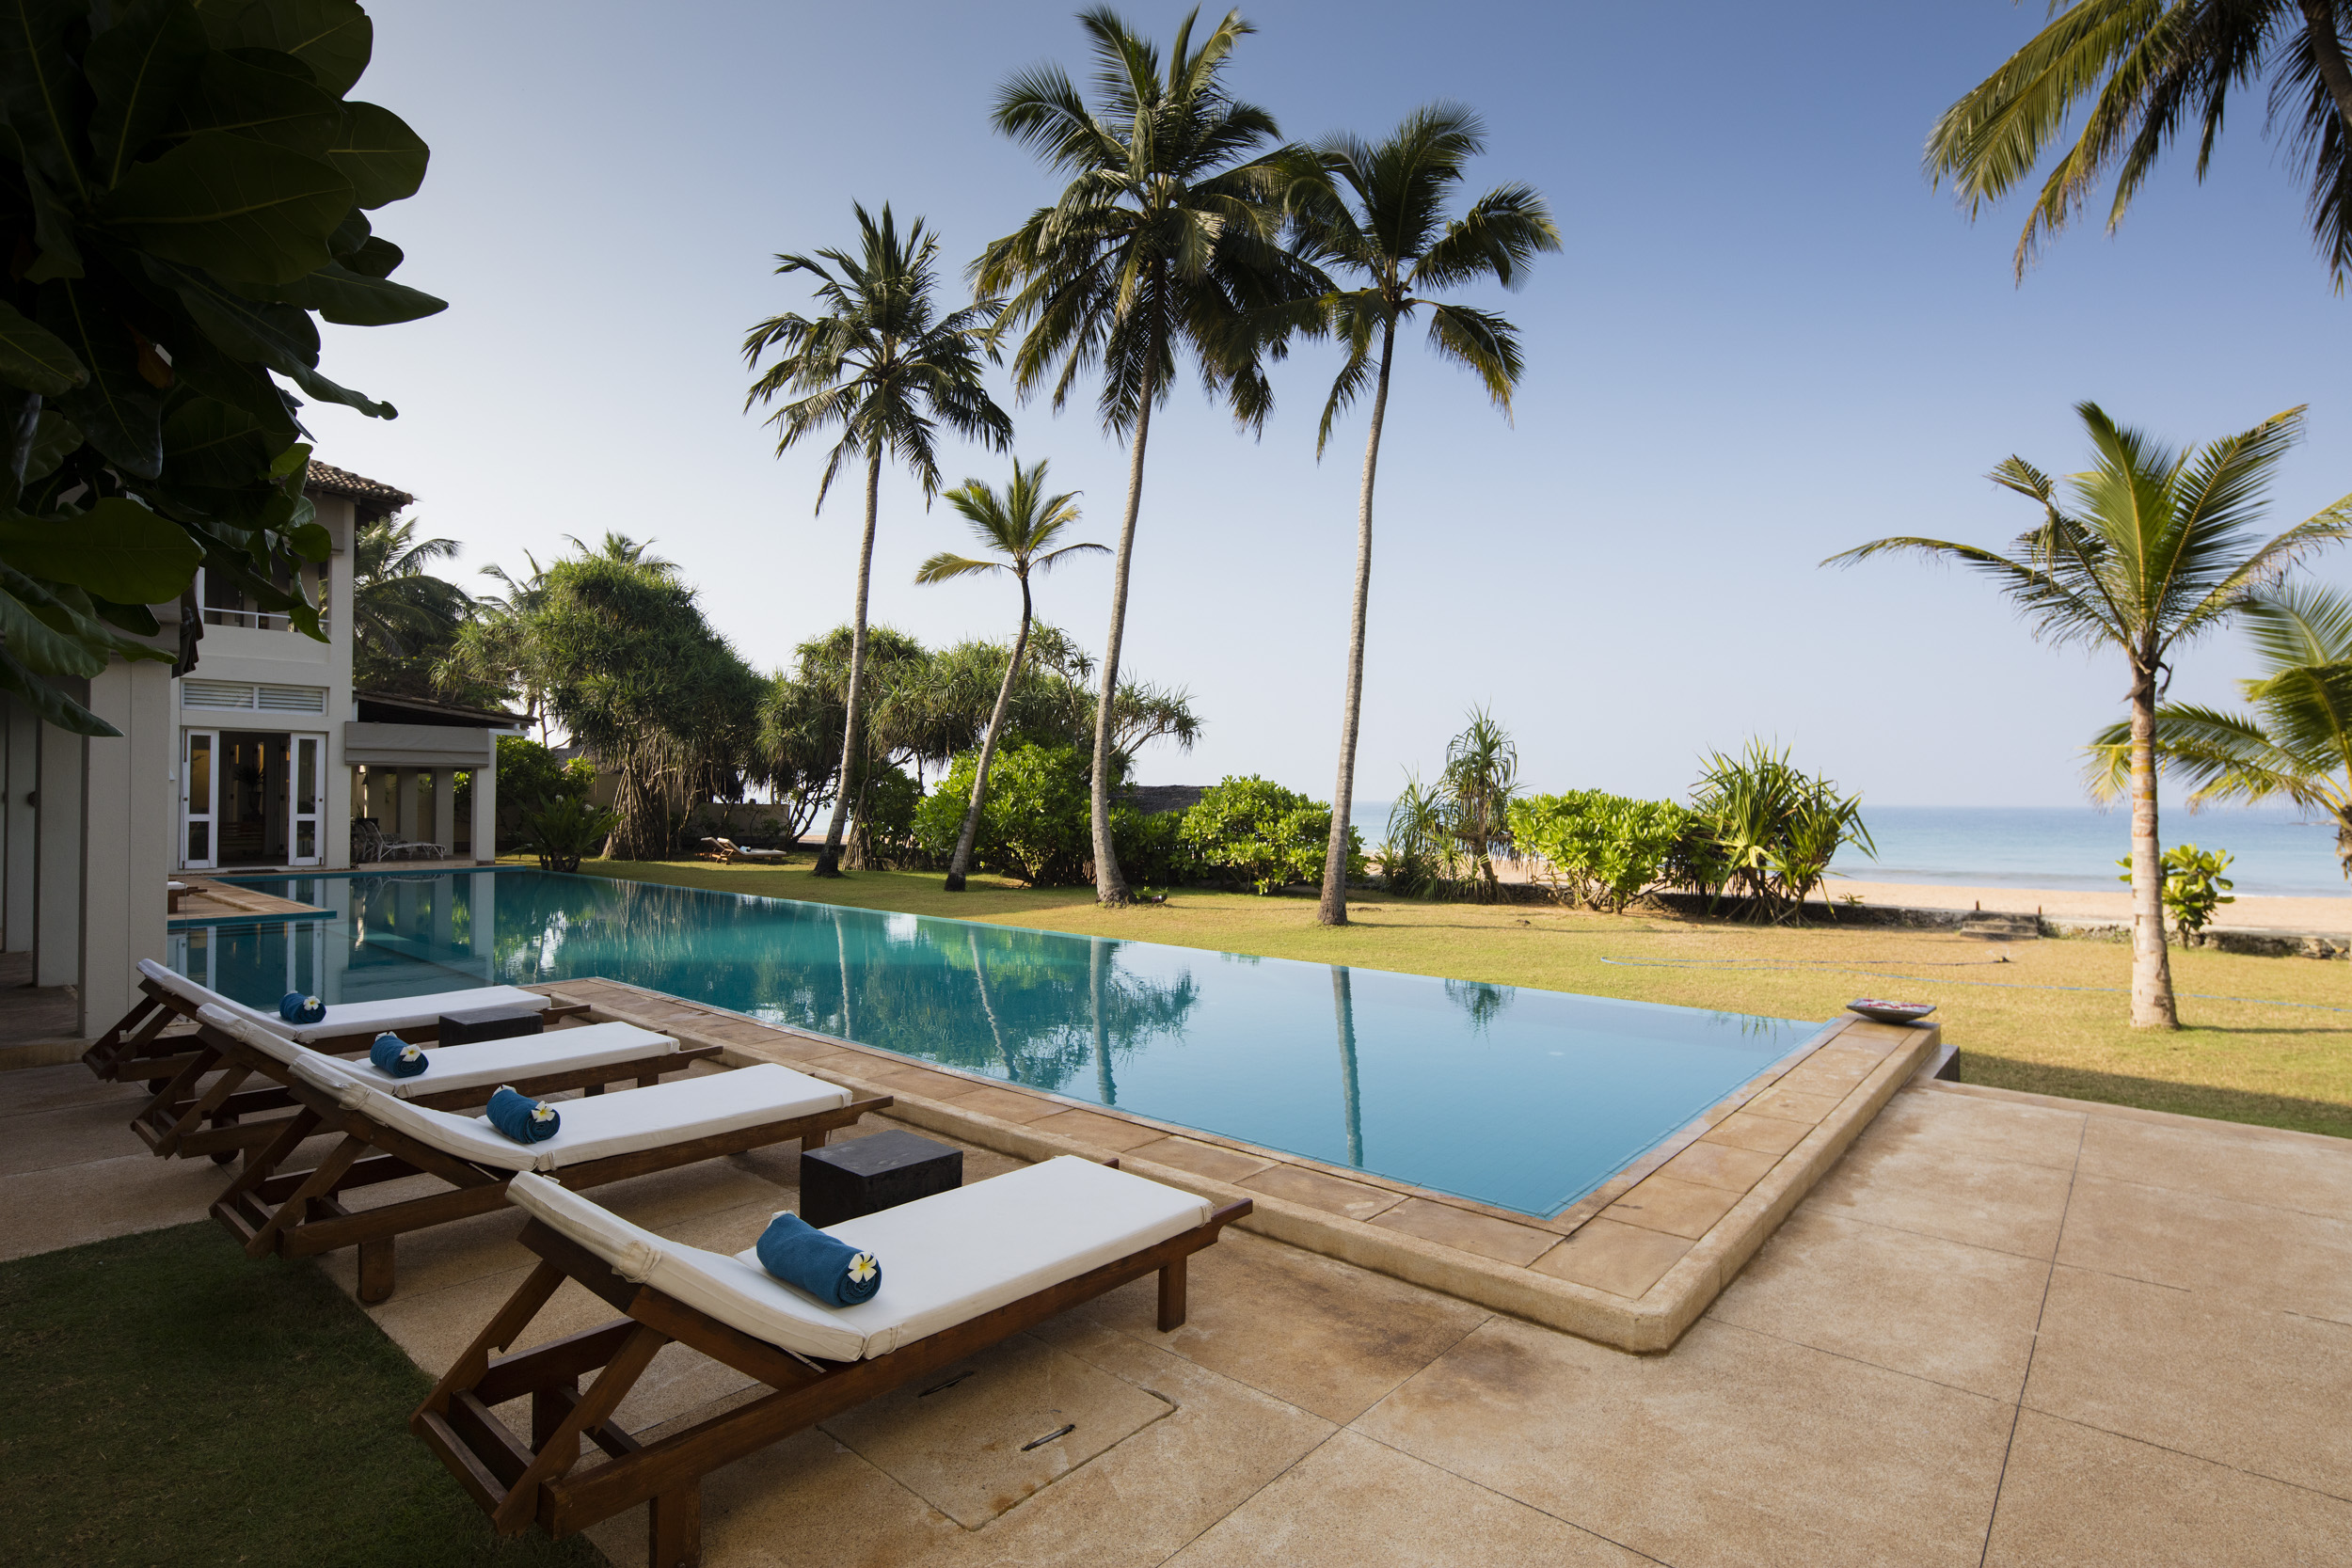 villa with pool on the beach in sri lanka